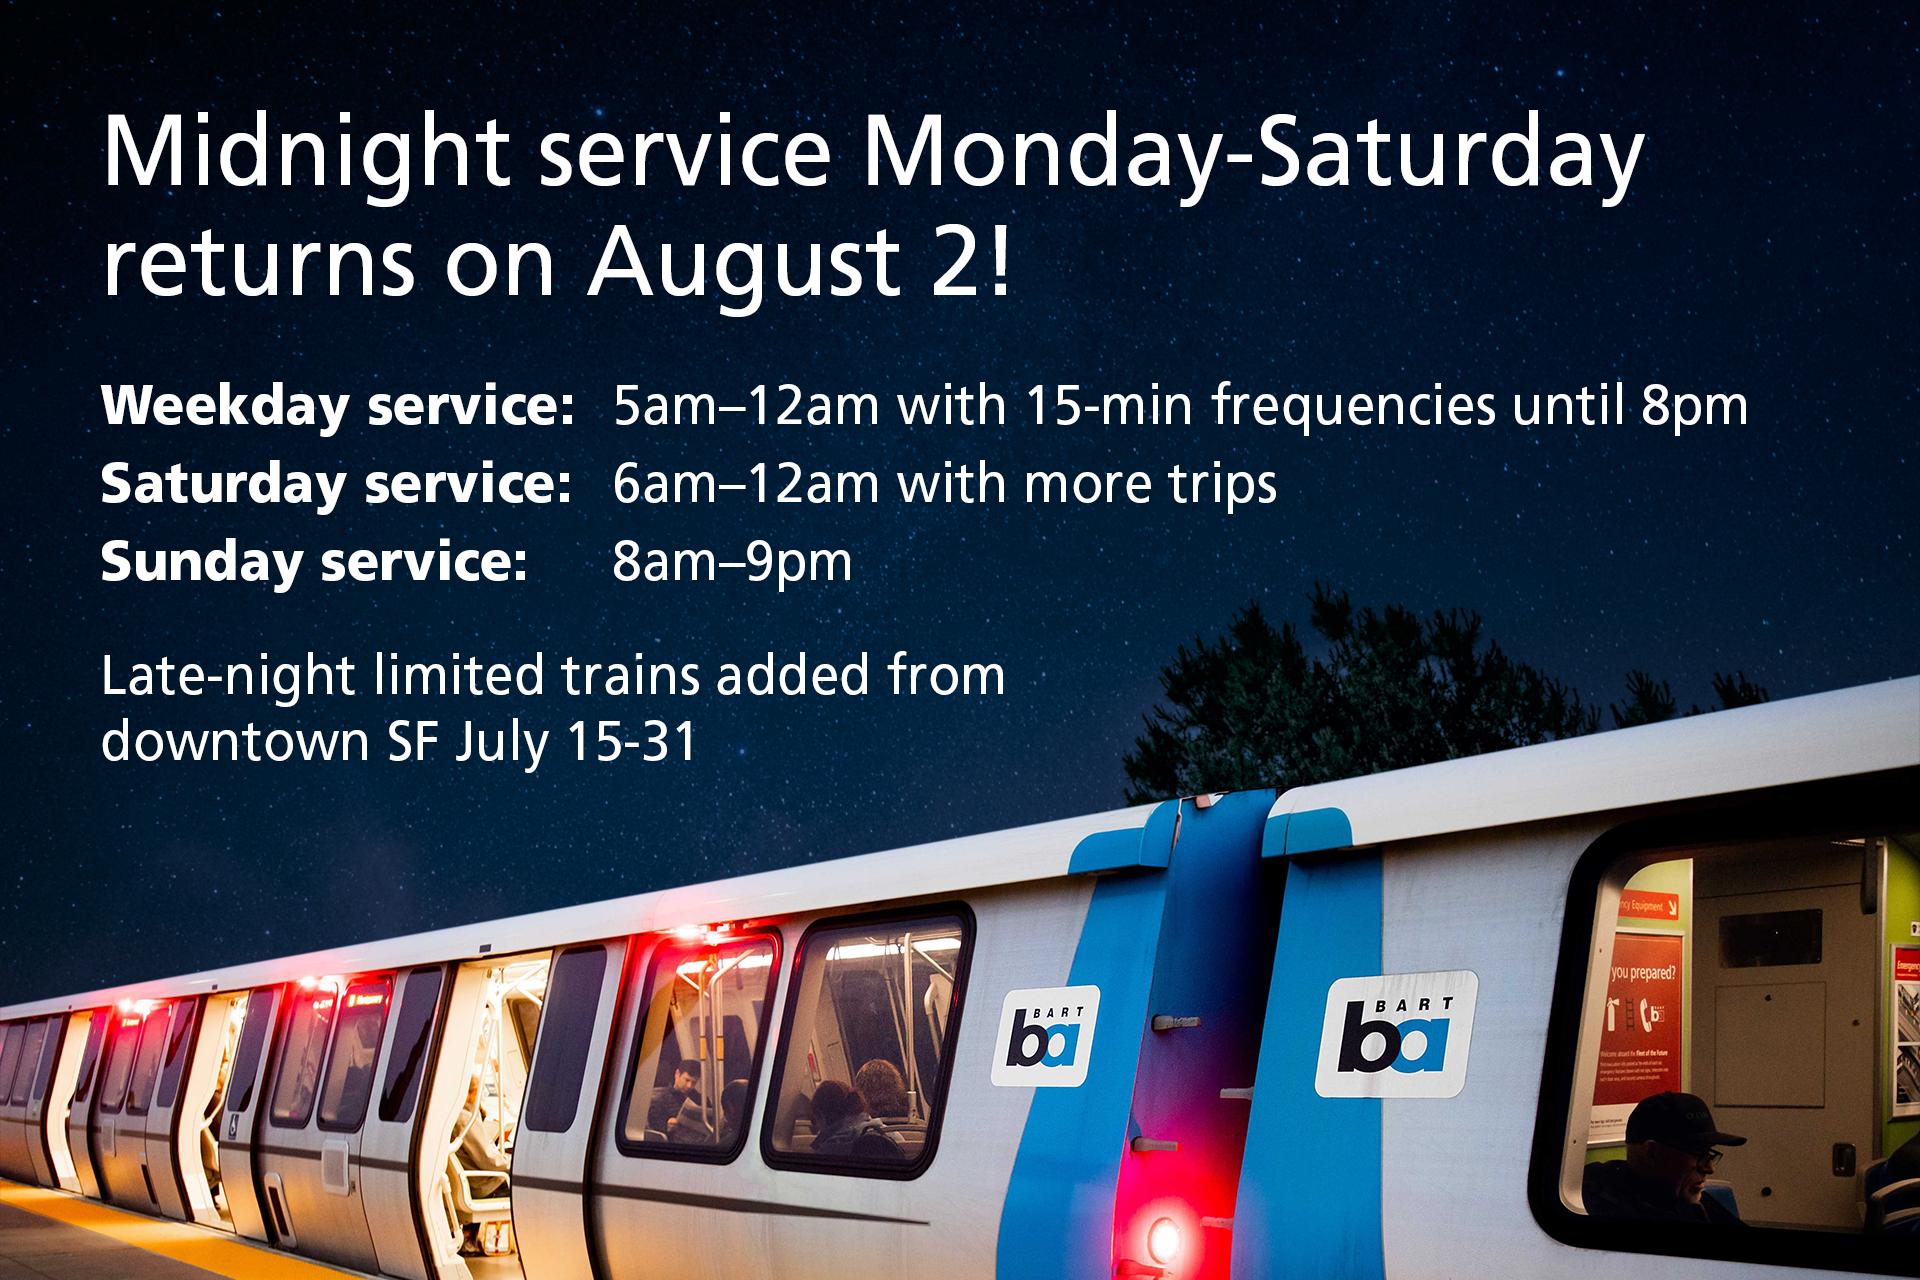 BART evening service returning on August 2